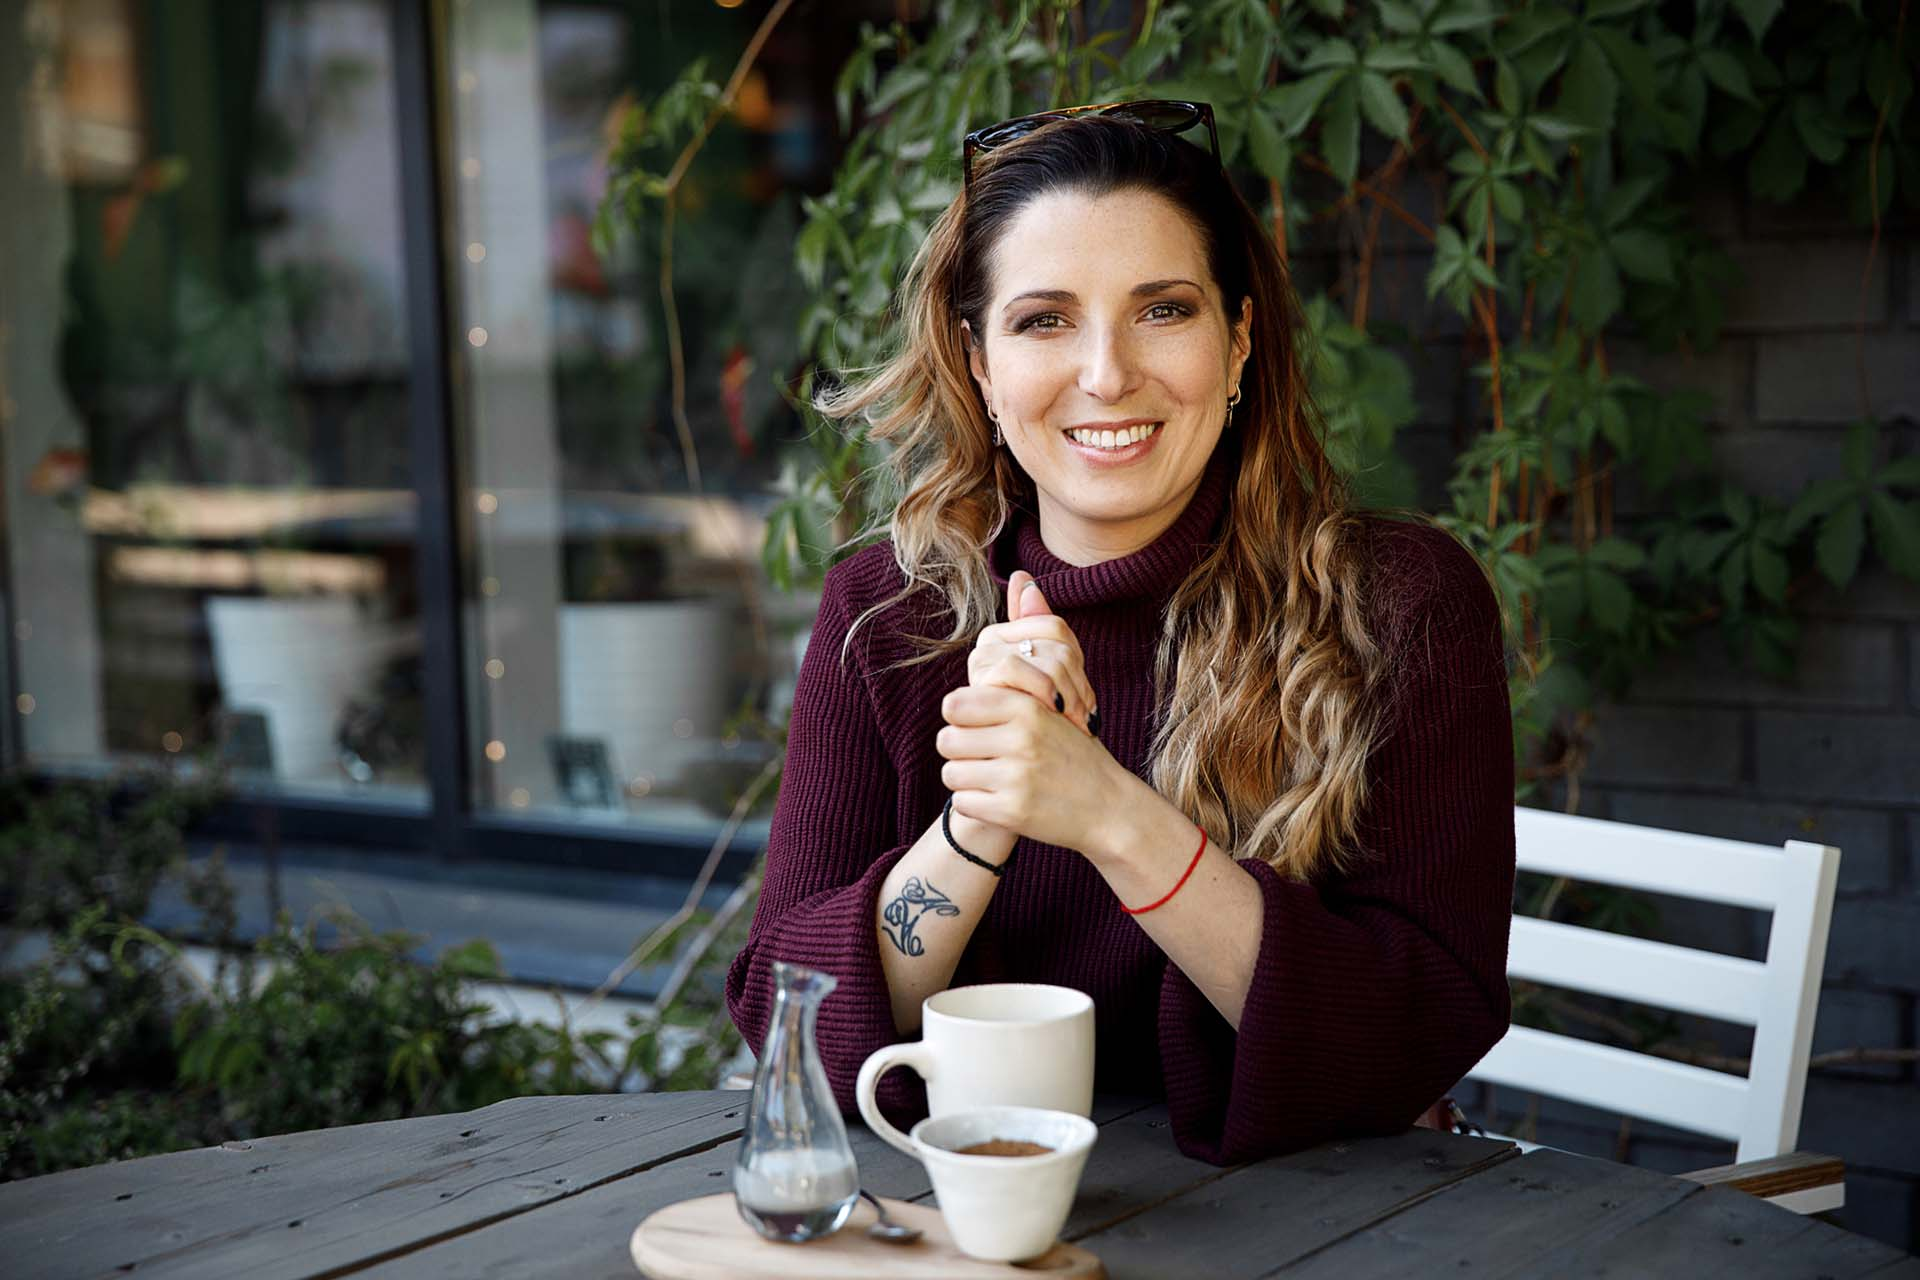 Ангелина Сурина - Lifecoach, психолог личностного роста, нейропсихолог, педагог, журналист